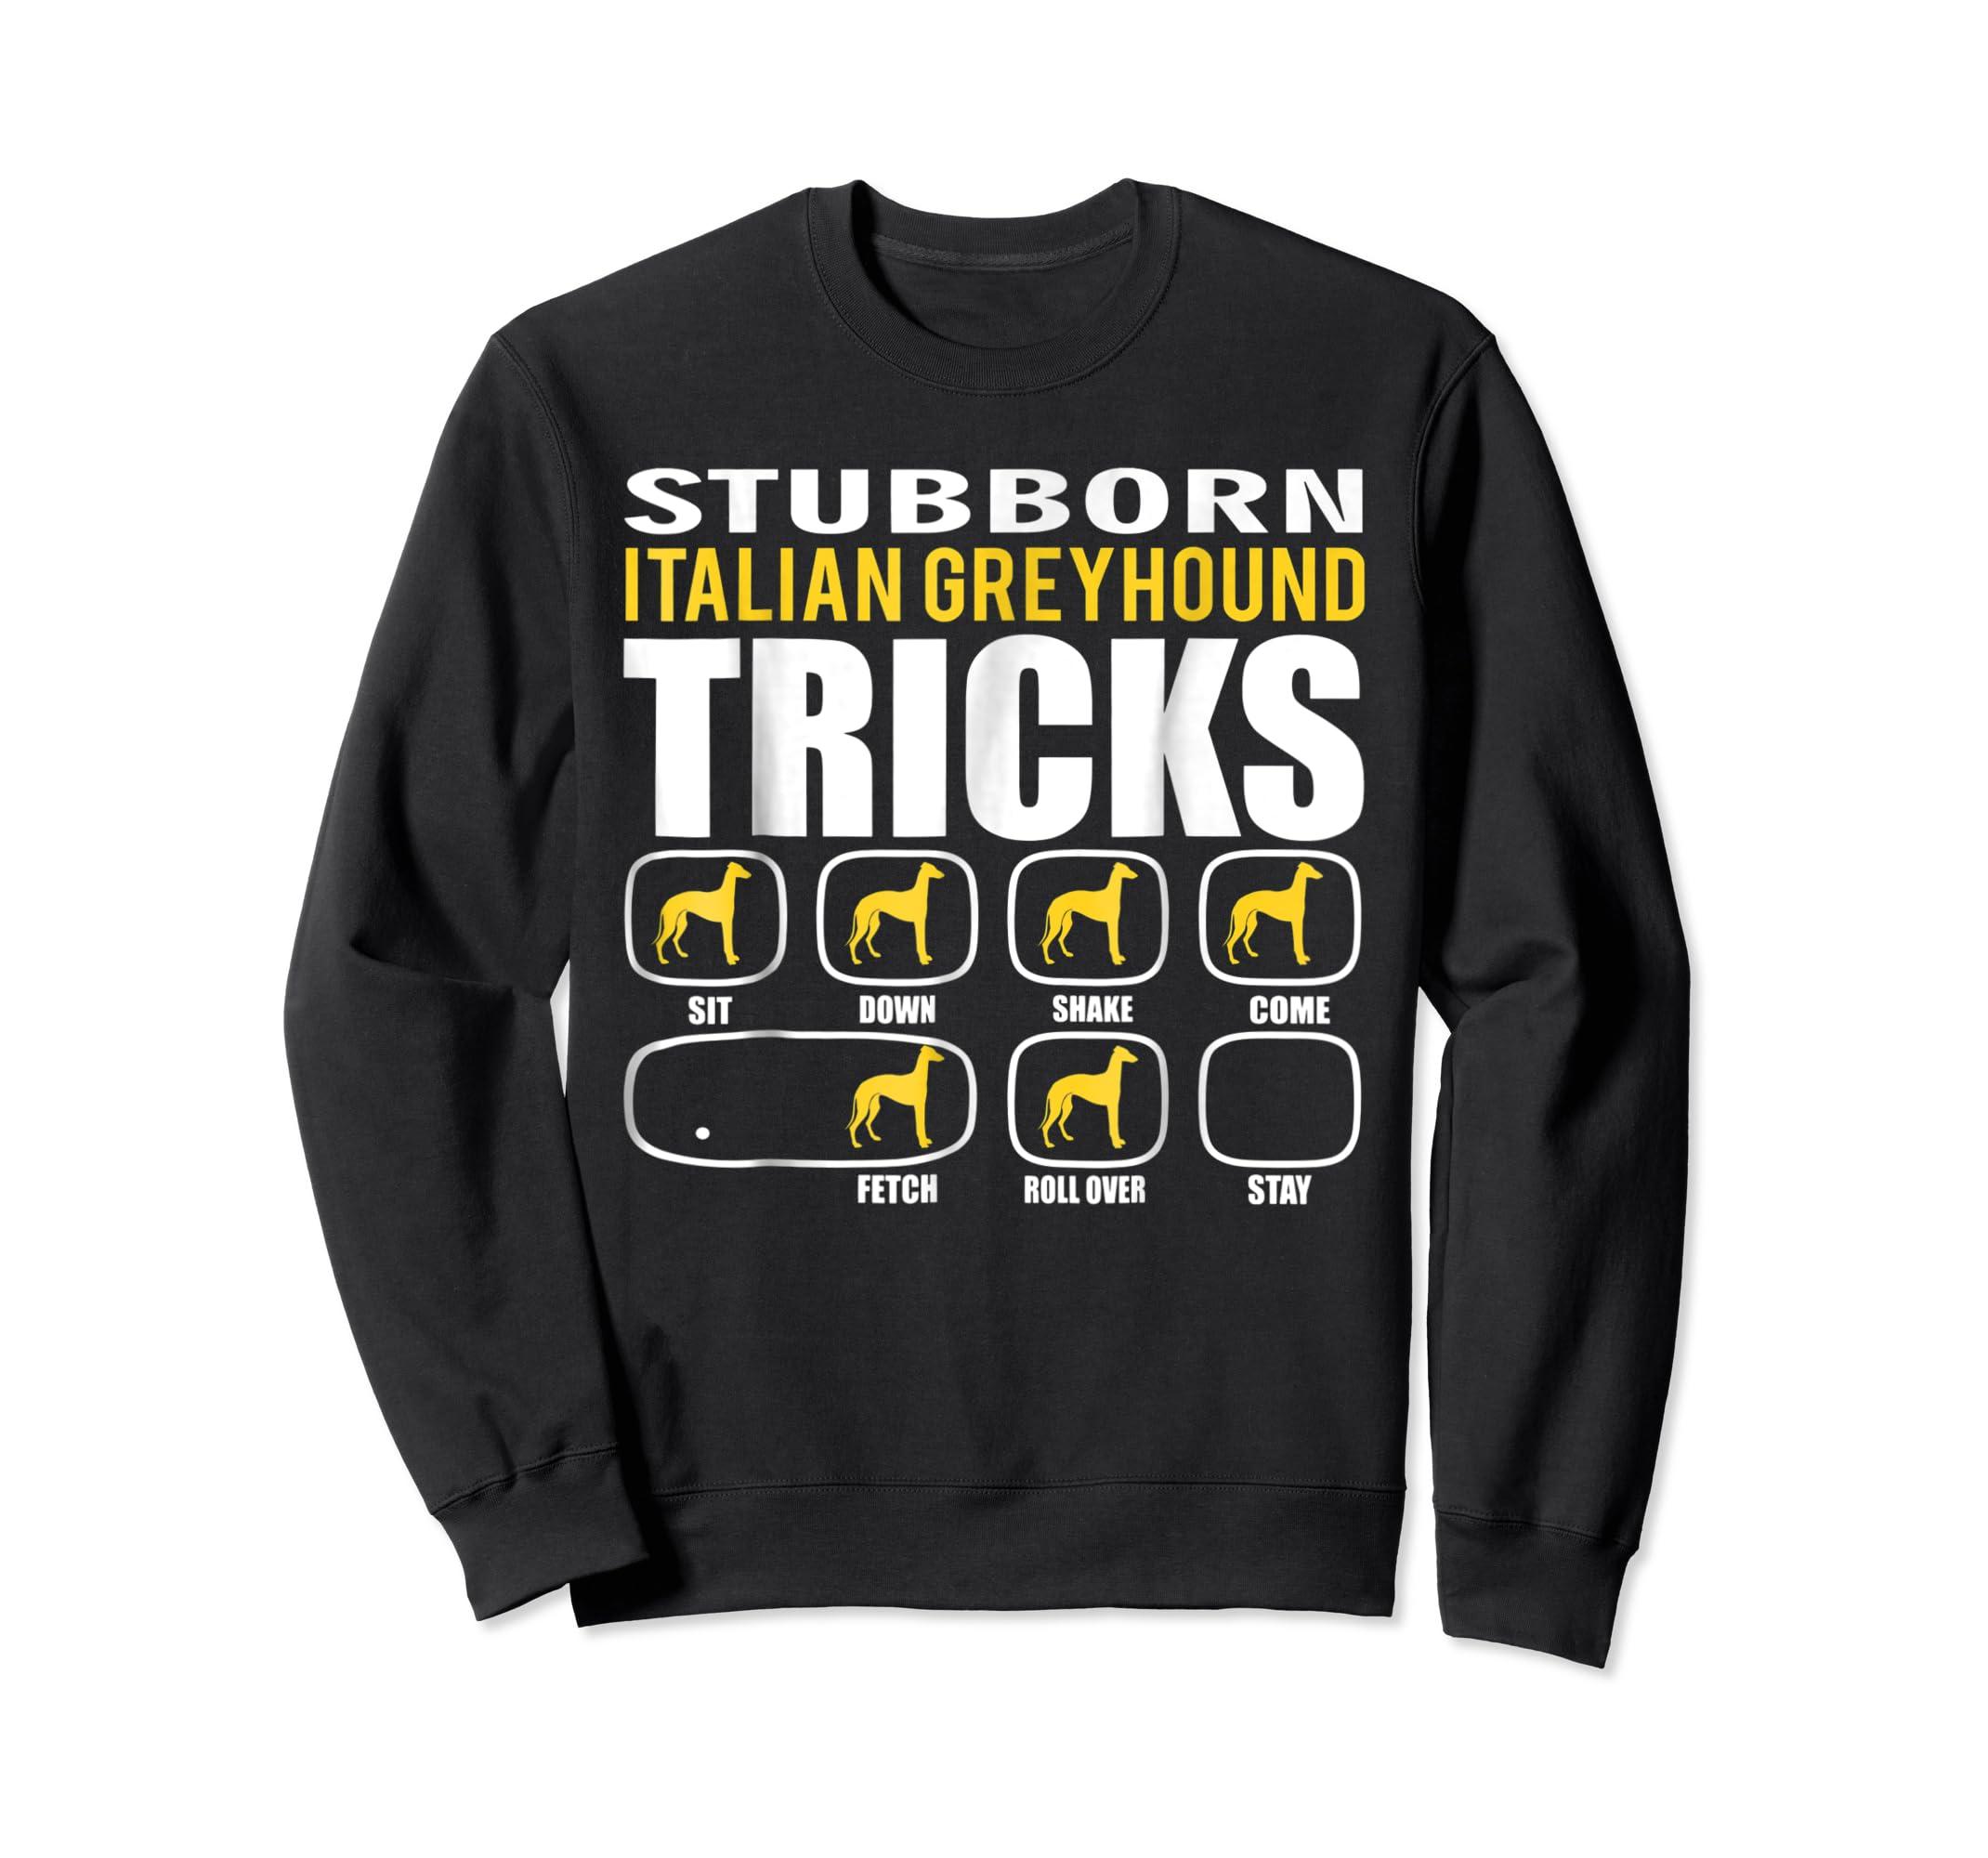 Funny Stubborn Italian Greyhound Tricks T-Shirt-Sweatshirt-Black